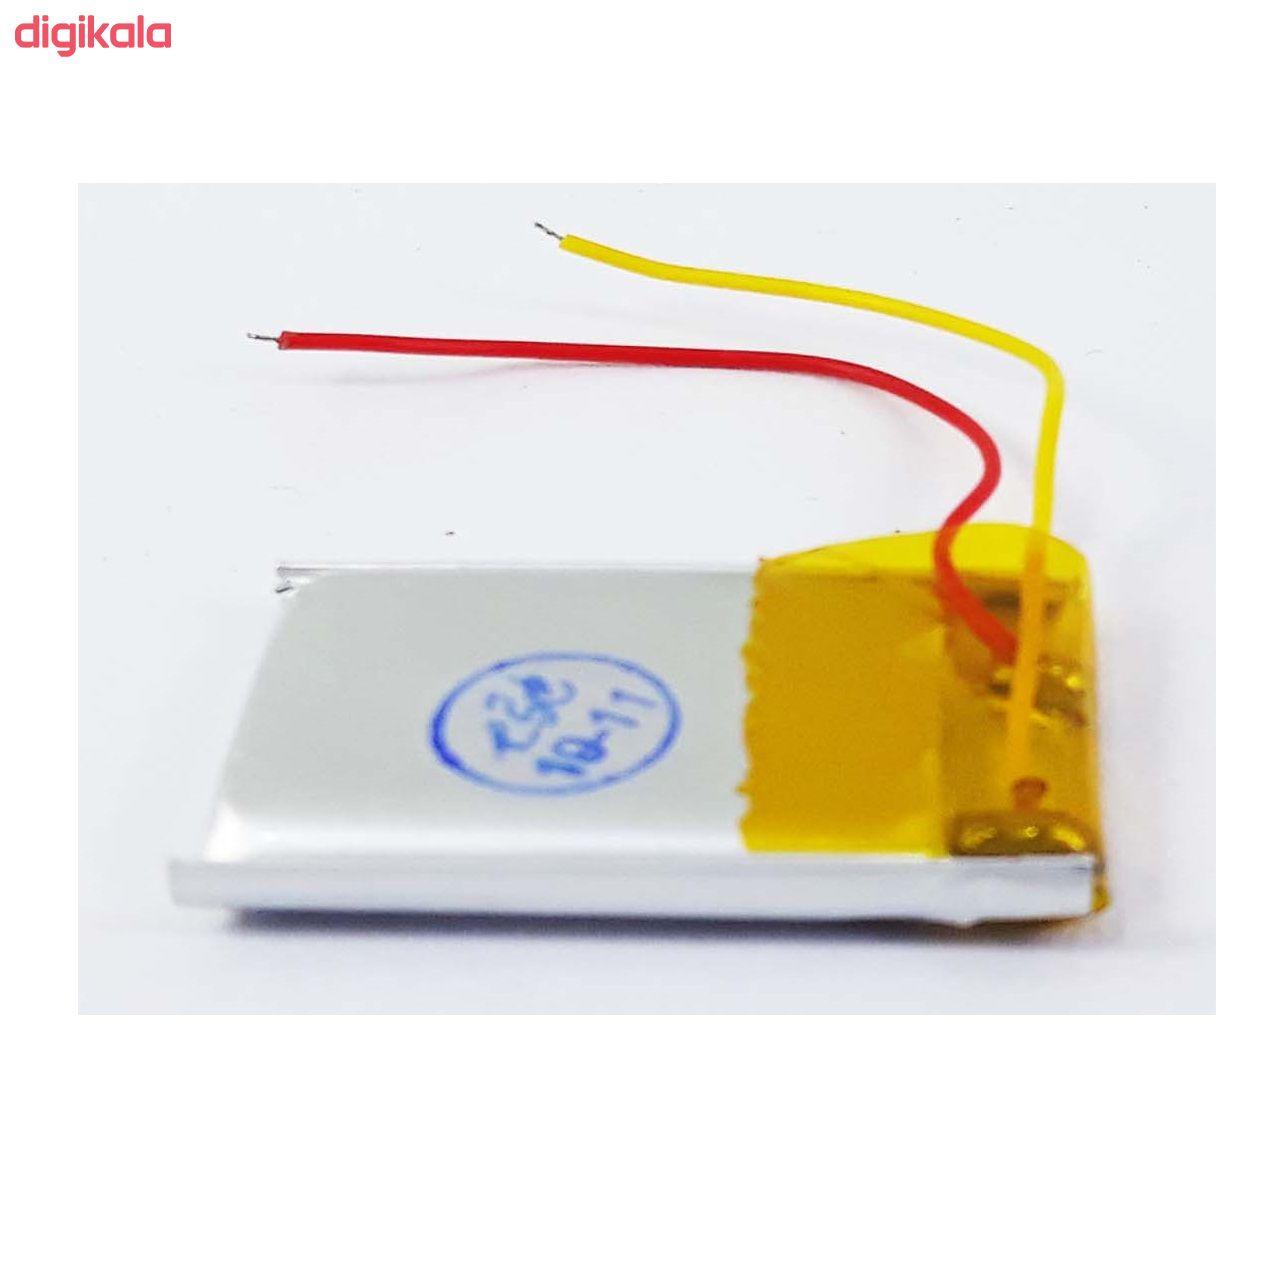 باتری لیتیوم یون قابل شارژ مدل Head-01 ظرفیت200میلی آمپر ساعت  main 1 1